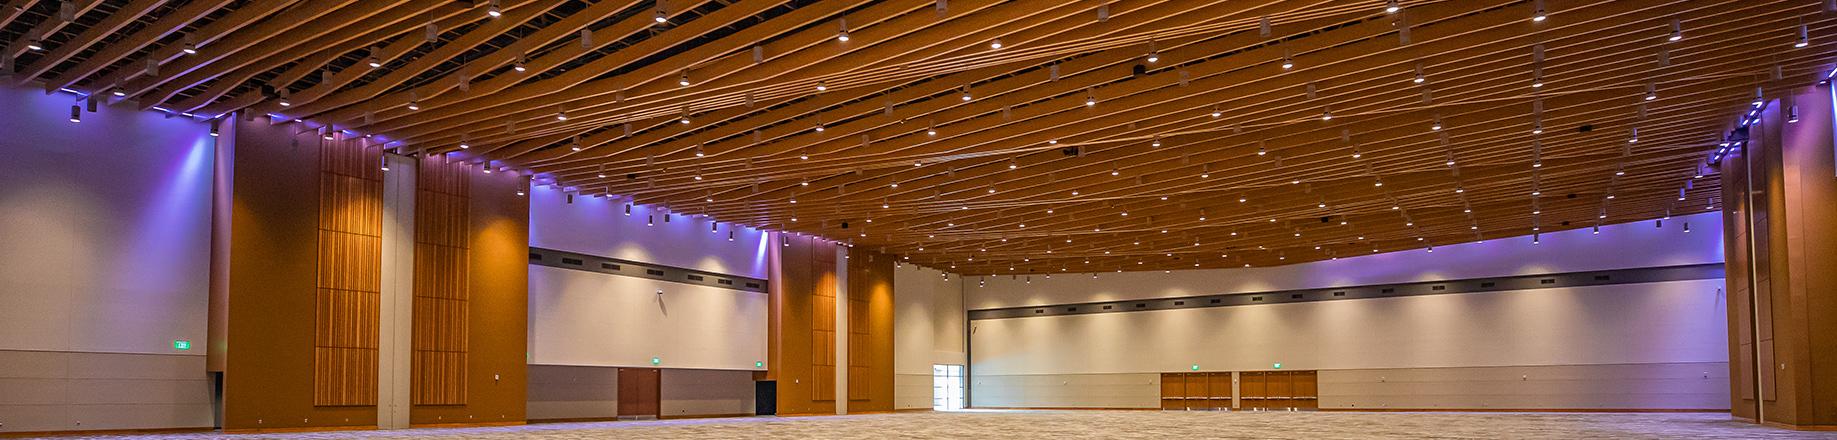 cl-specialty-ceilings-header-1